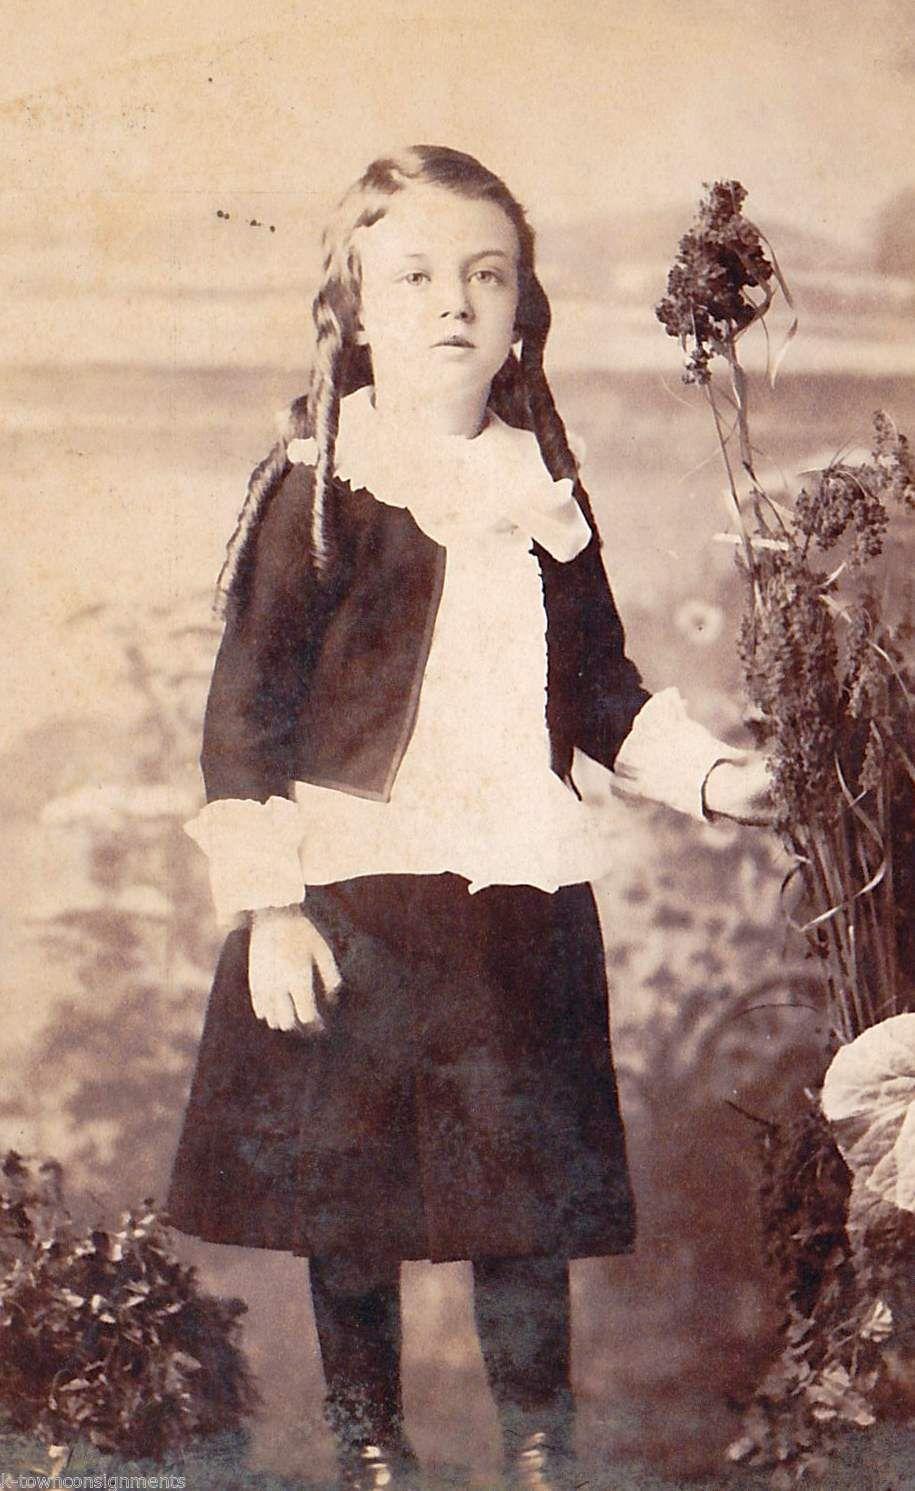 long haired boys in dresses long hair little boy fautleroy suit kilt dress antique